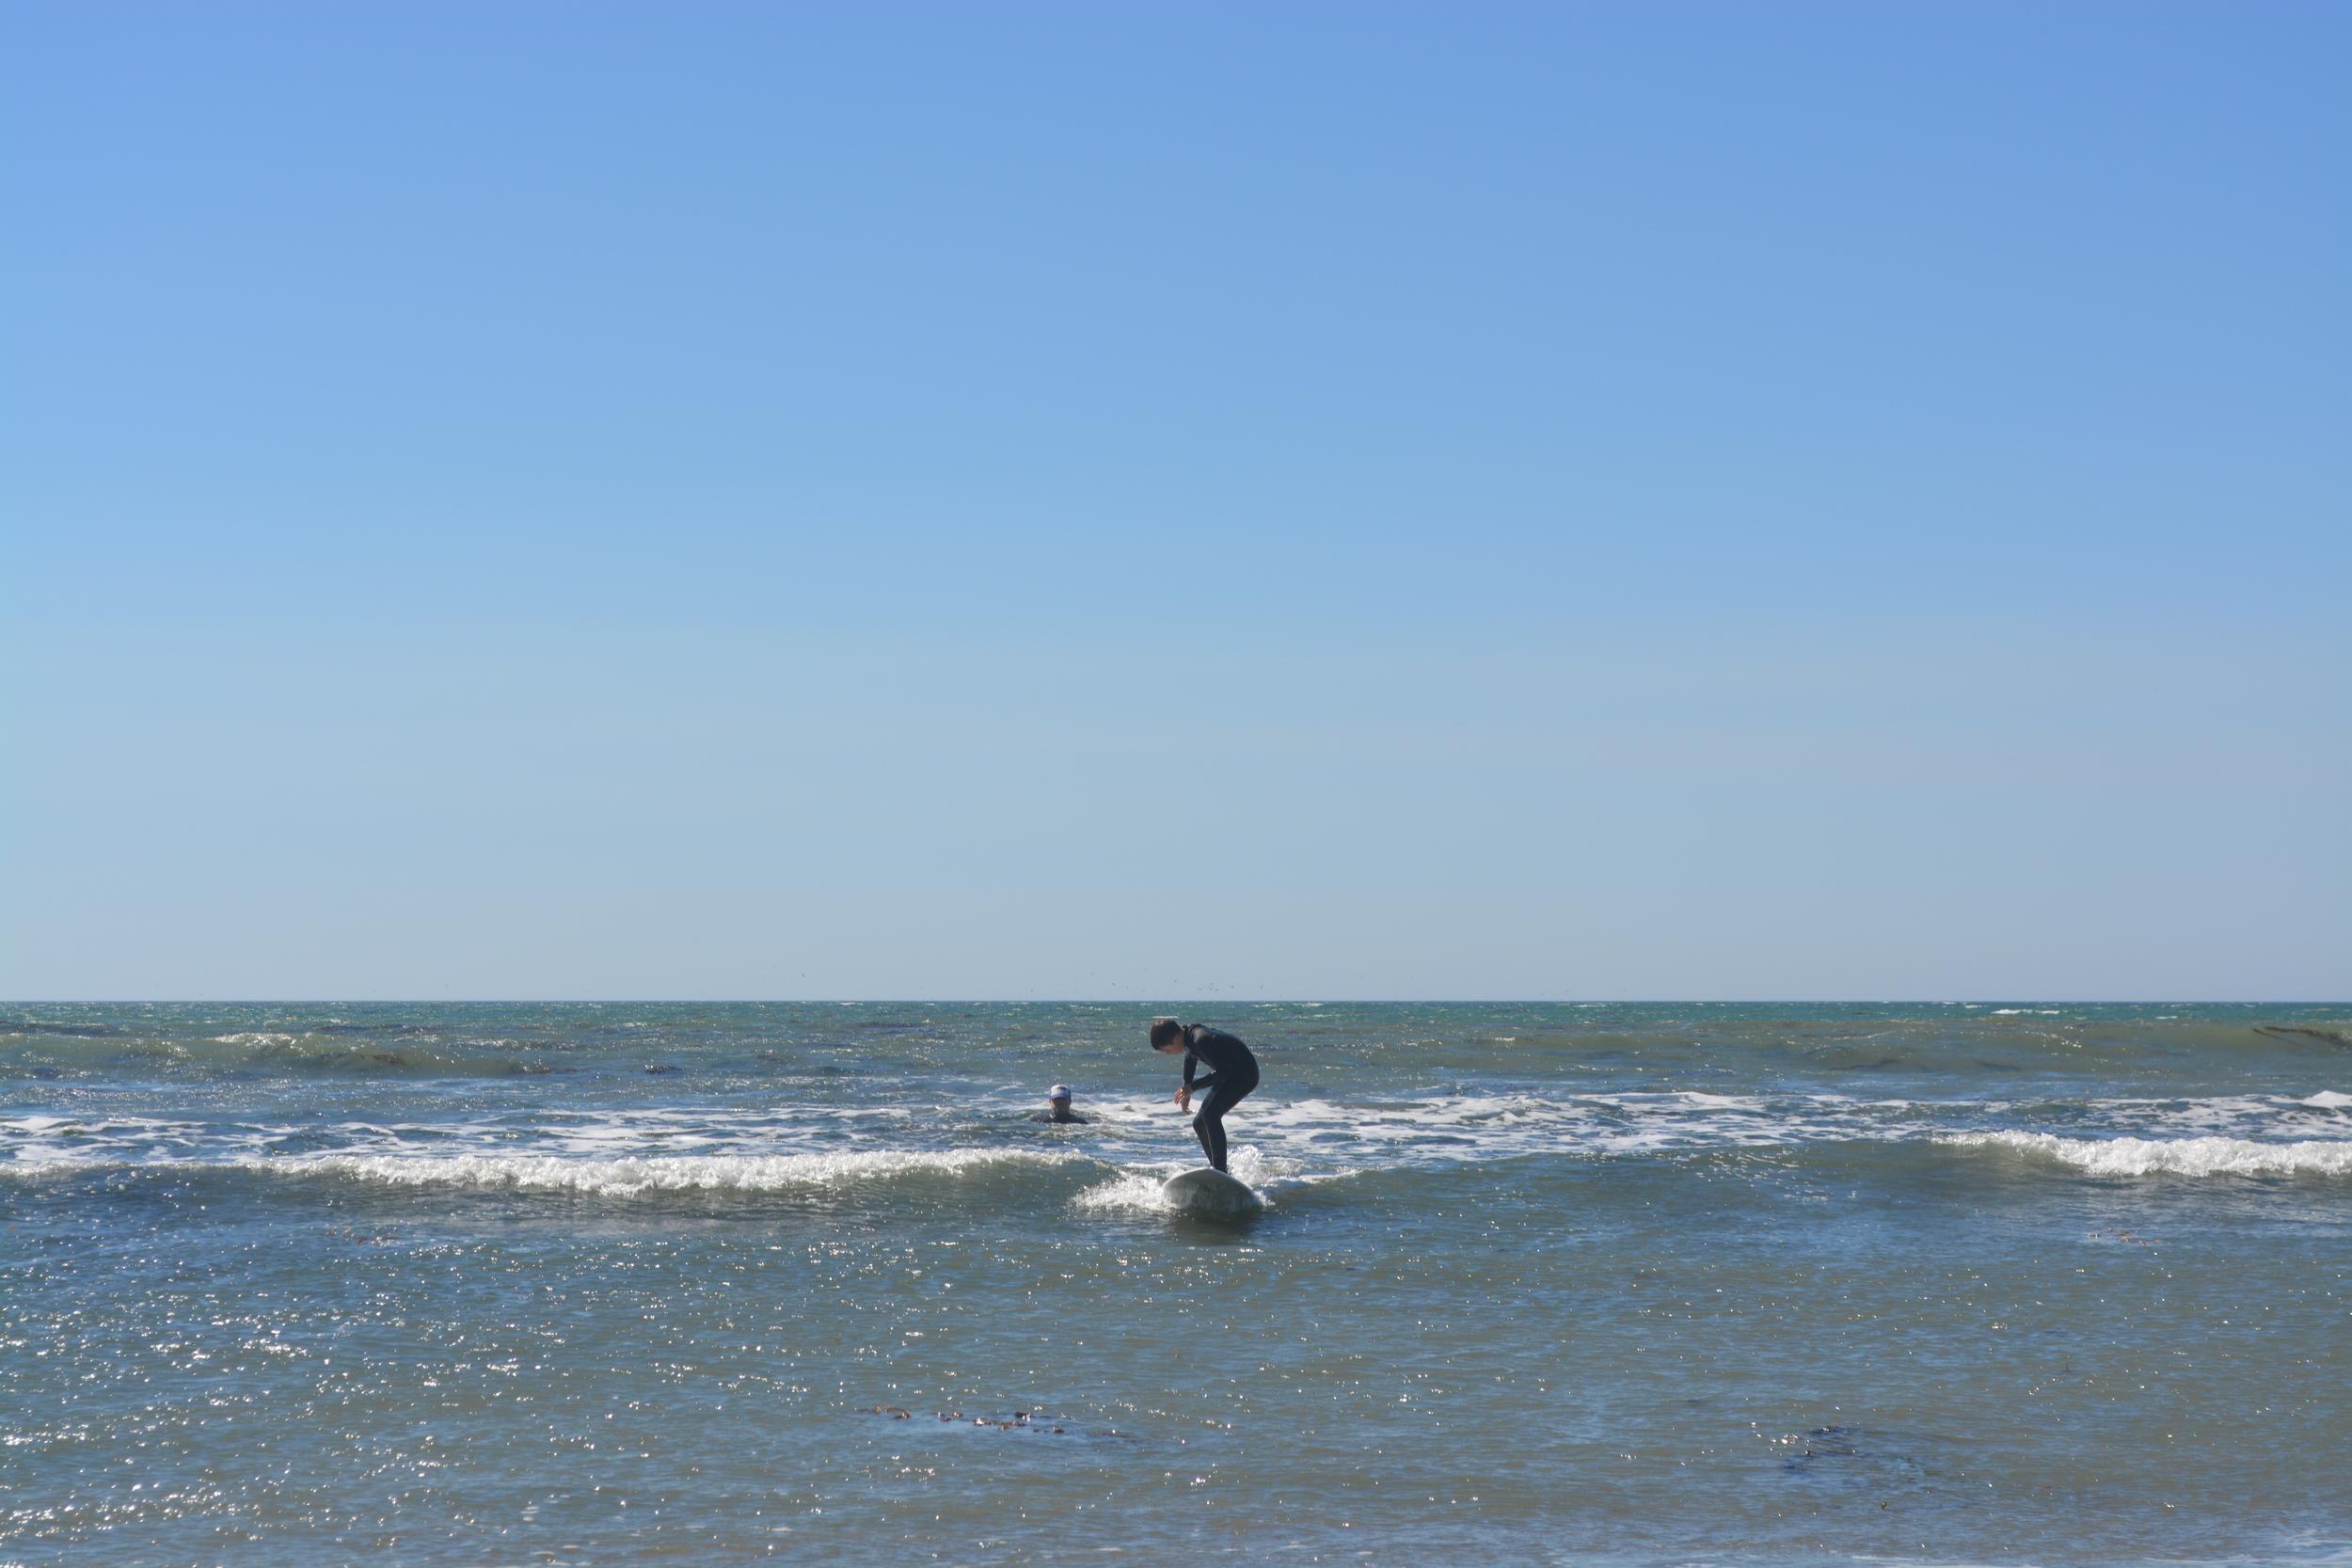 Baja California 10-5-13 Shipwrecks Surfing Adventure Ocean Experience Surf School San Diego (7).JPG